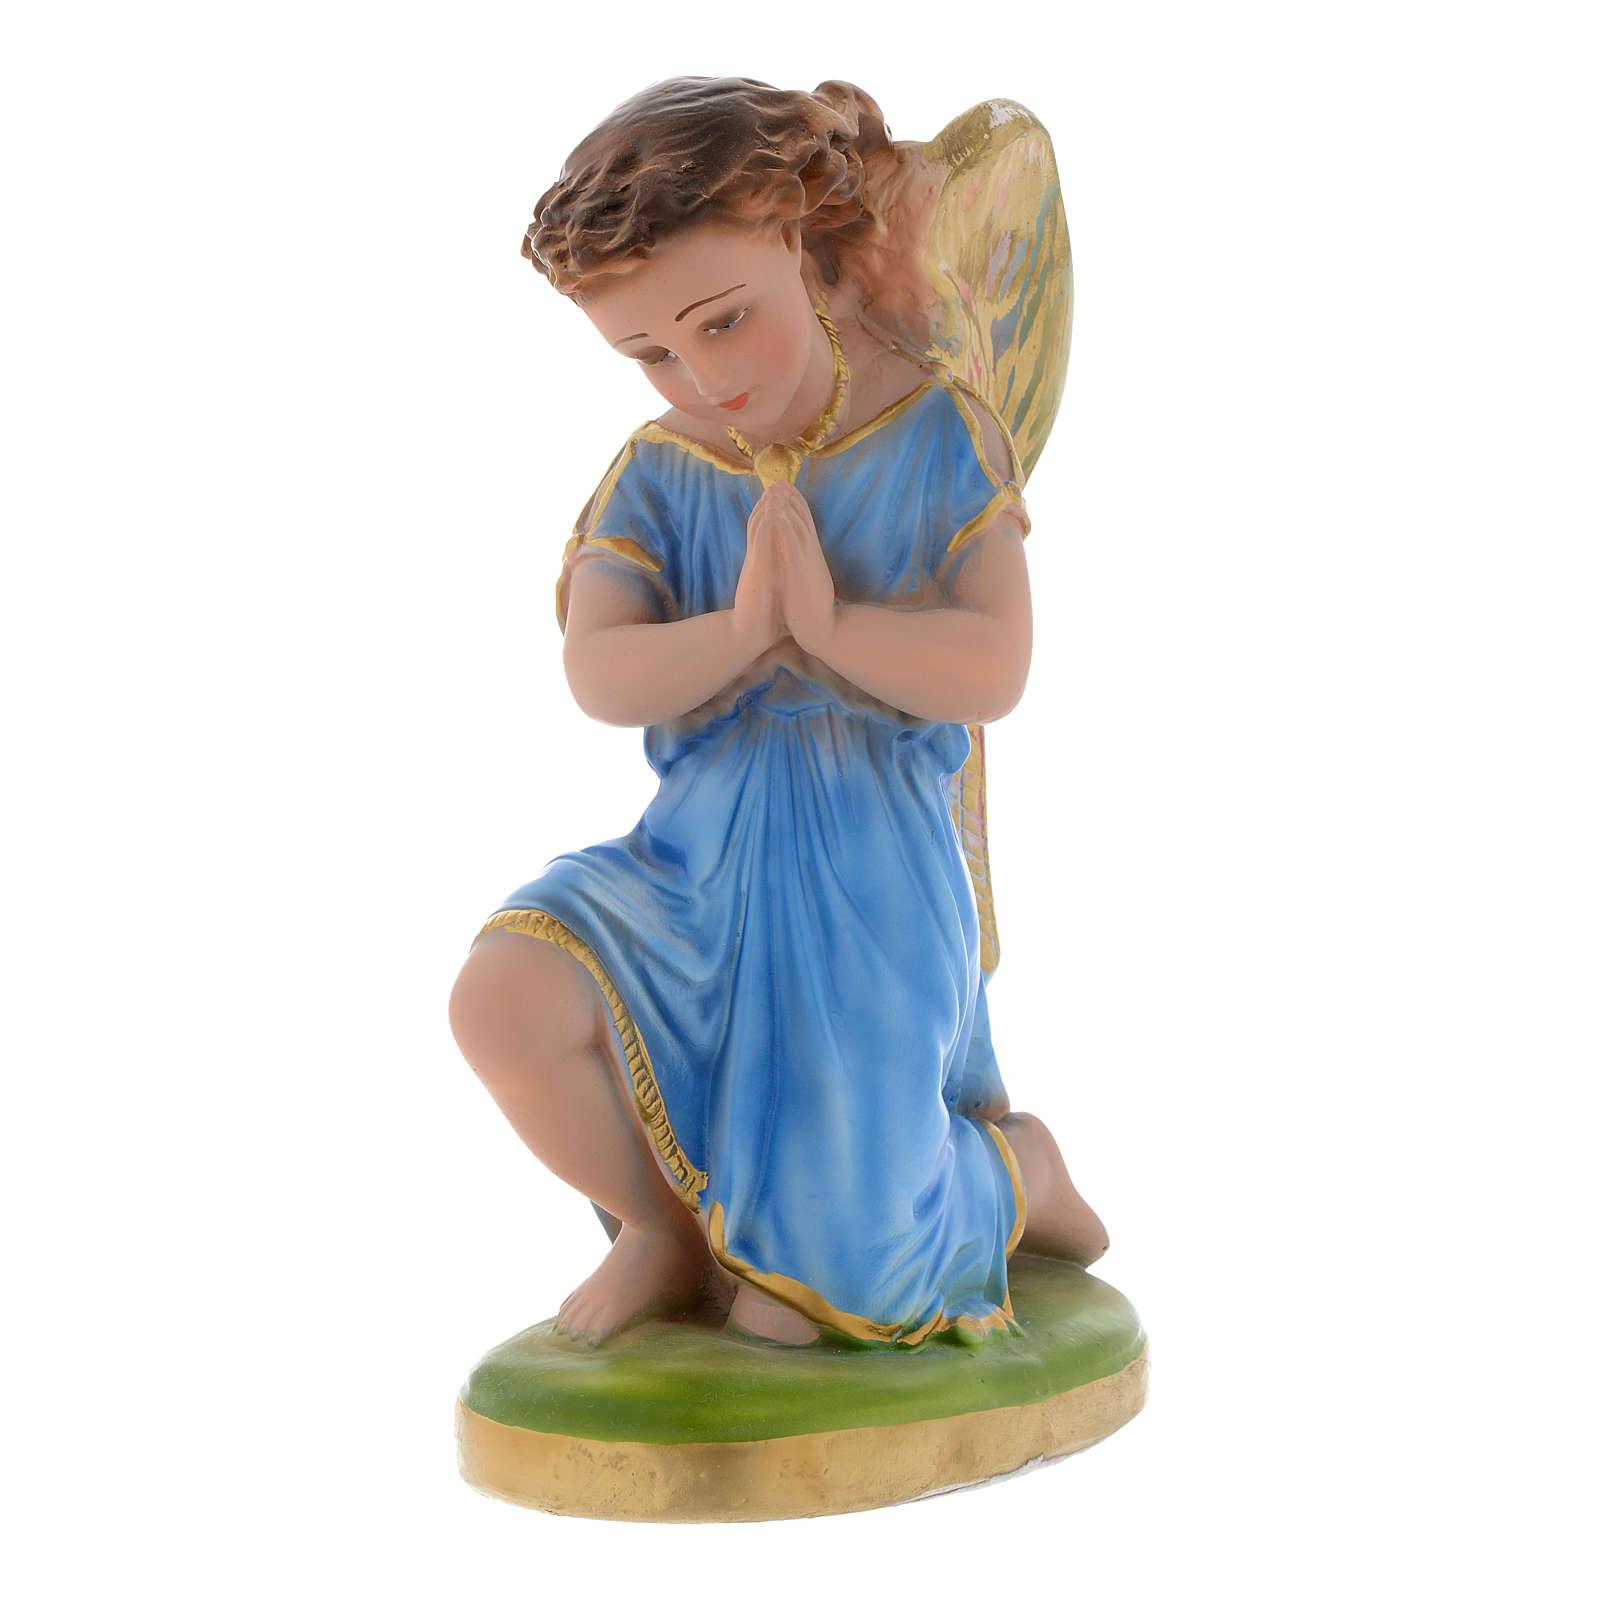 Angel in prayer with blue dress 25 cm gypsum 4